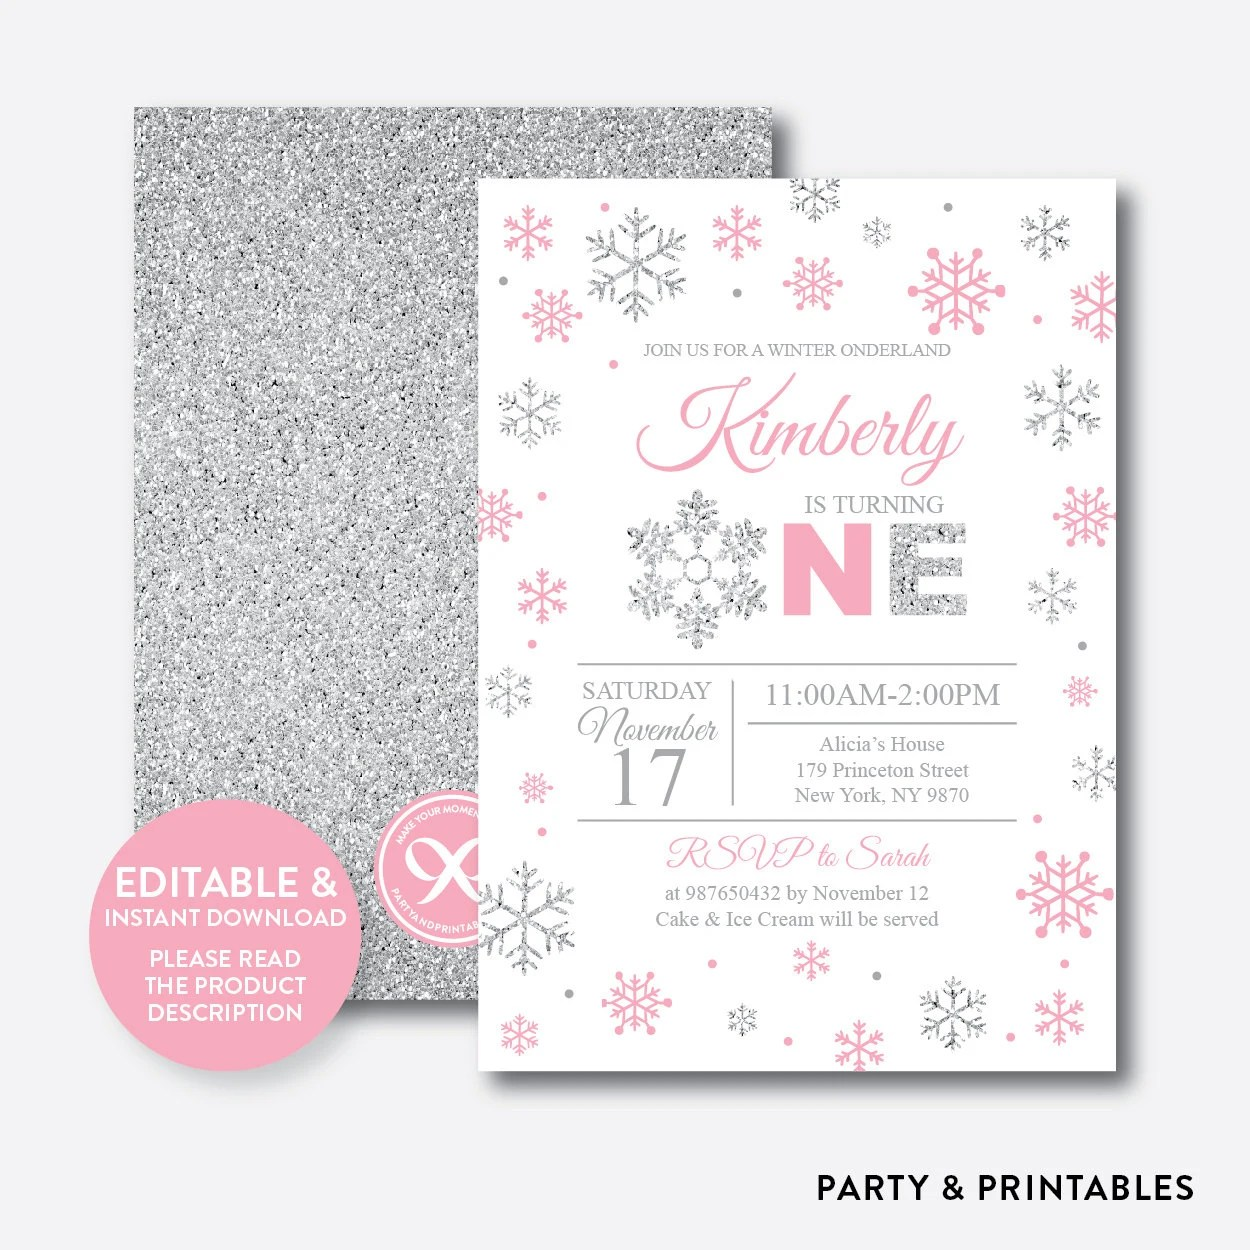 Instant Download, Editable Winter Onederland Birthday Invitation